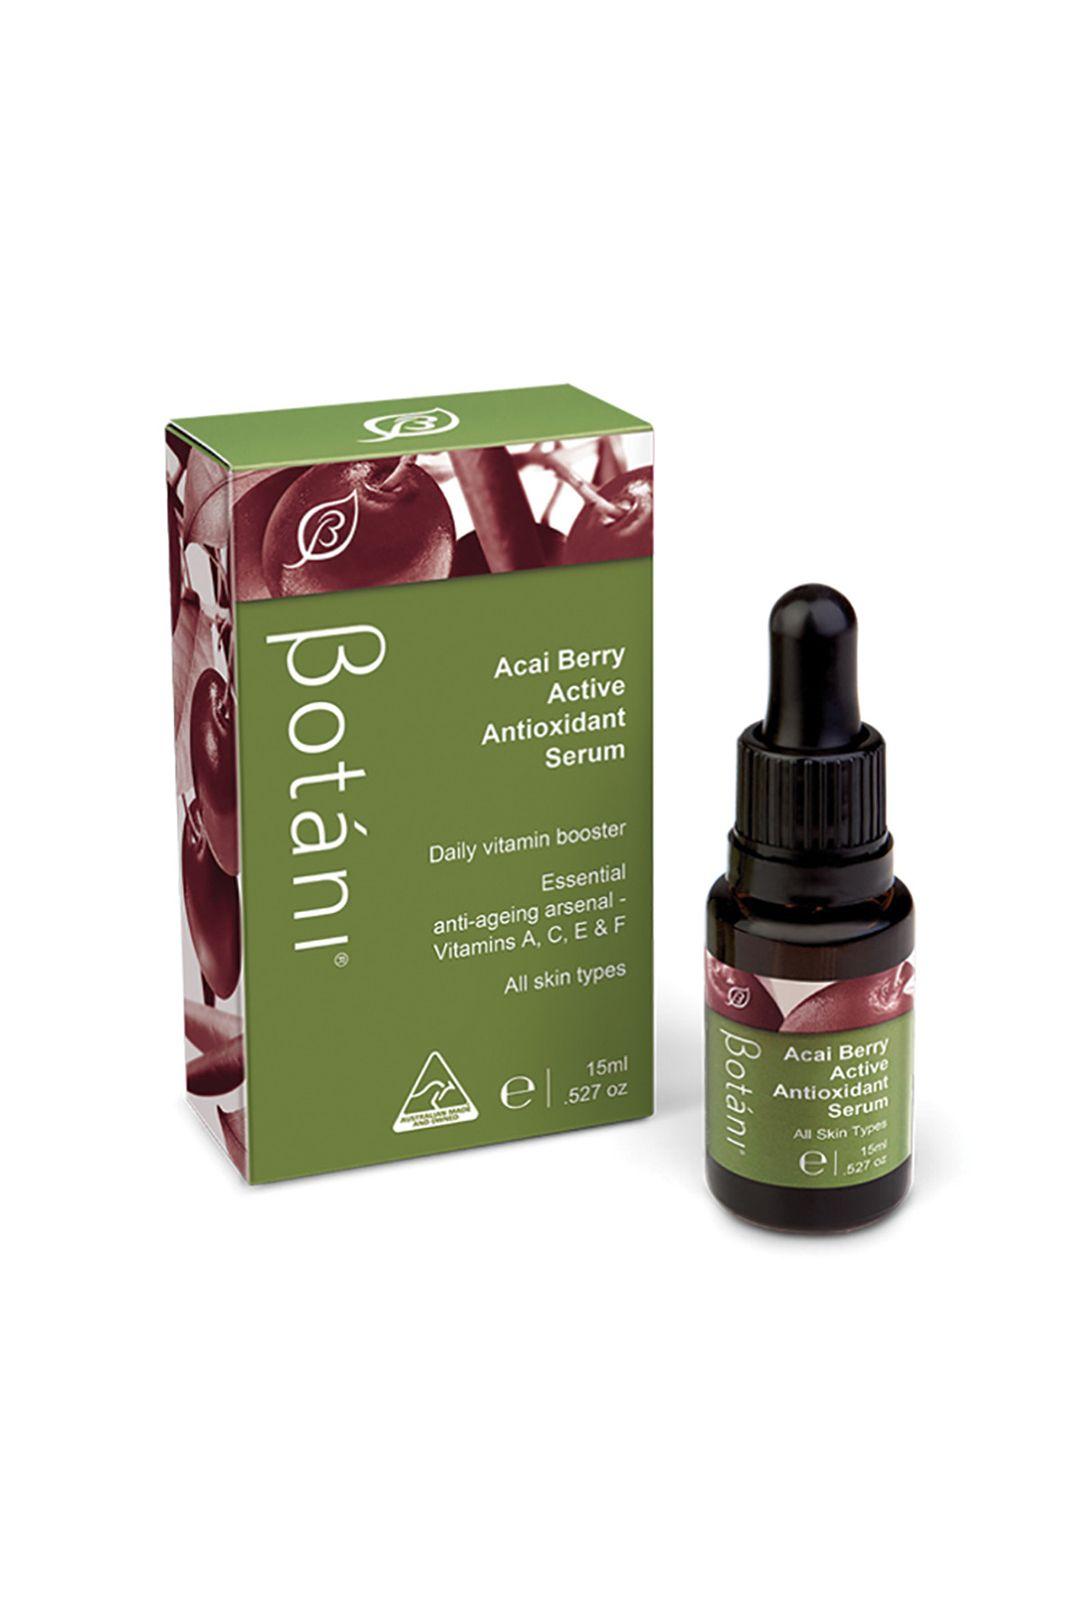 botani-acai-berry-active-antioxidant-serum-15ml